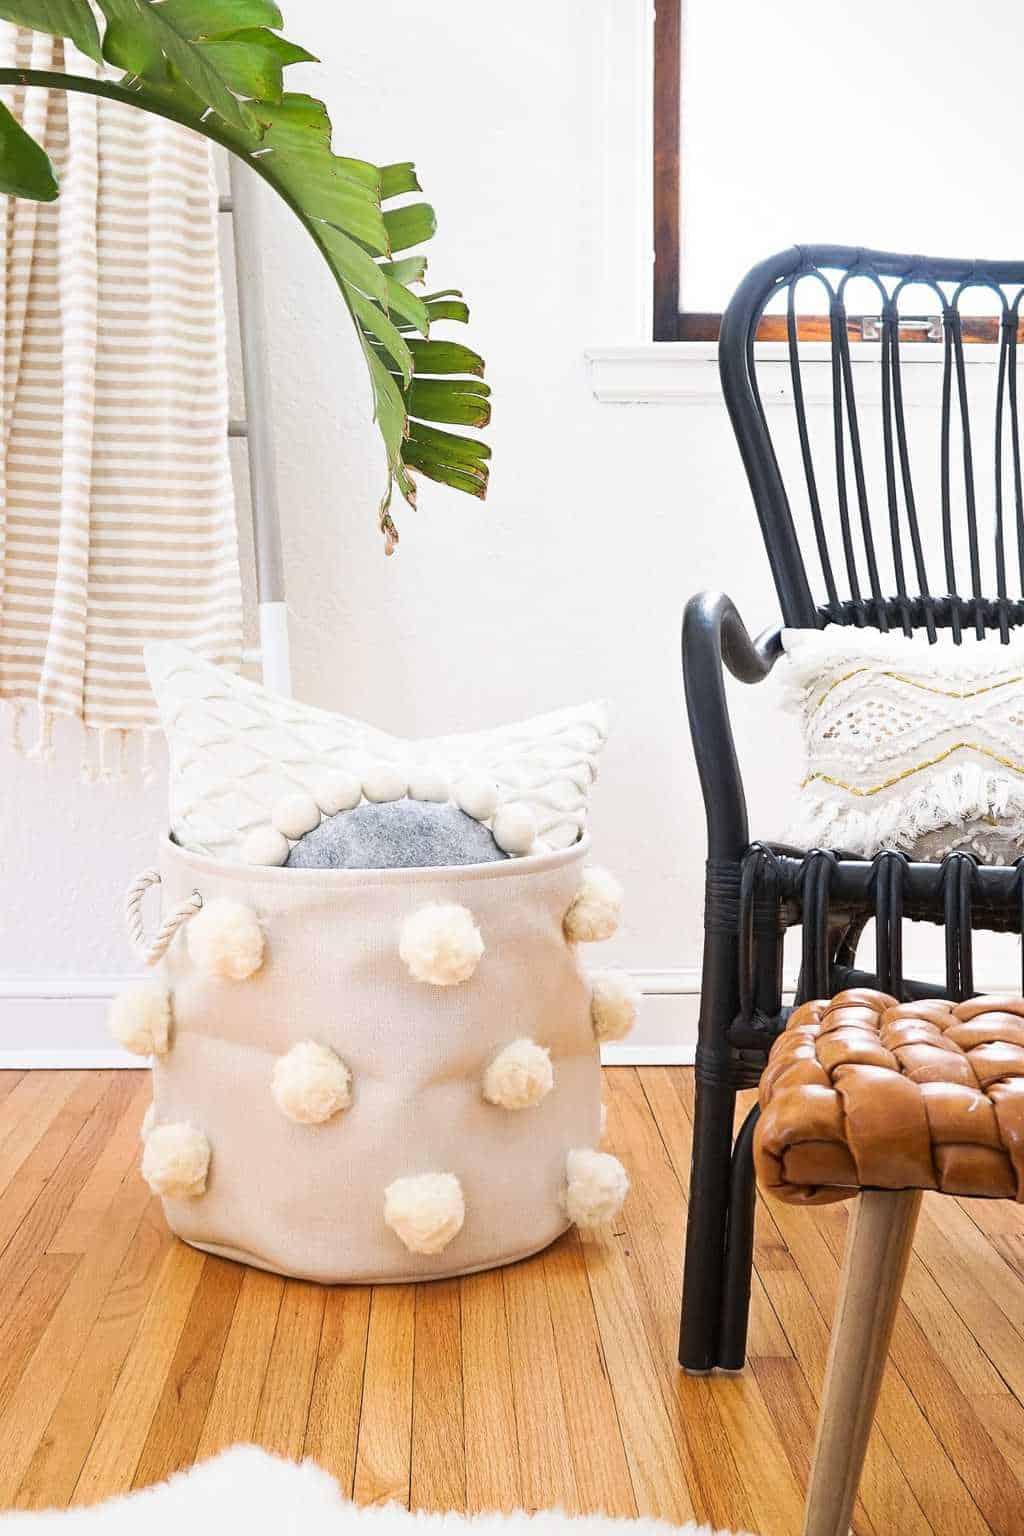 DIY Fluffy Pom Pom Bin by a chair